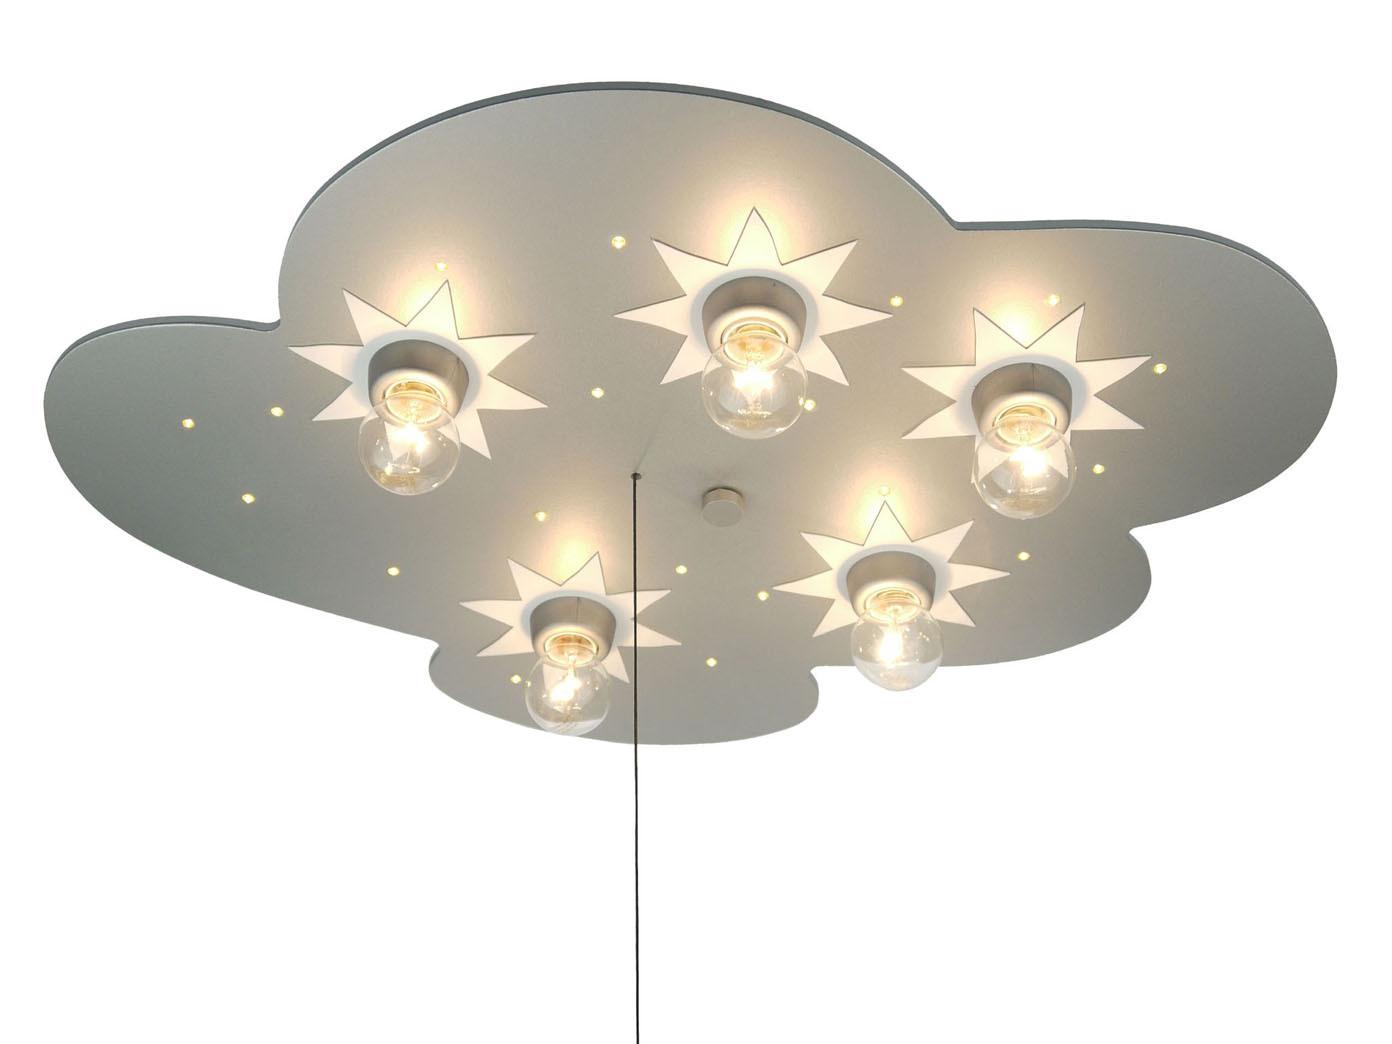 LED Kinder Deckenlampe Wolke Schlummerlicht LED Sternenhimmel ...